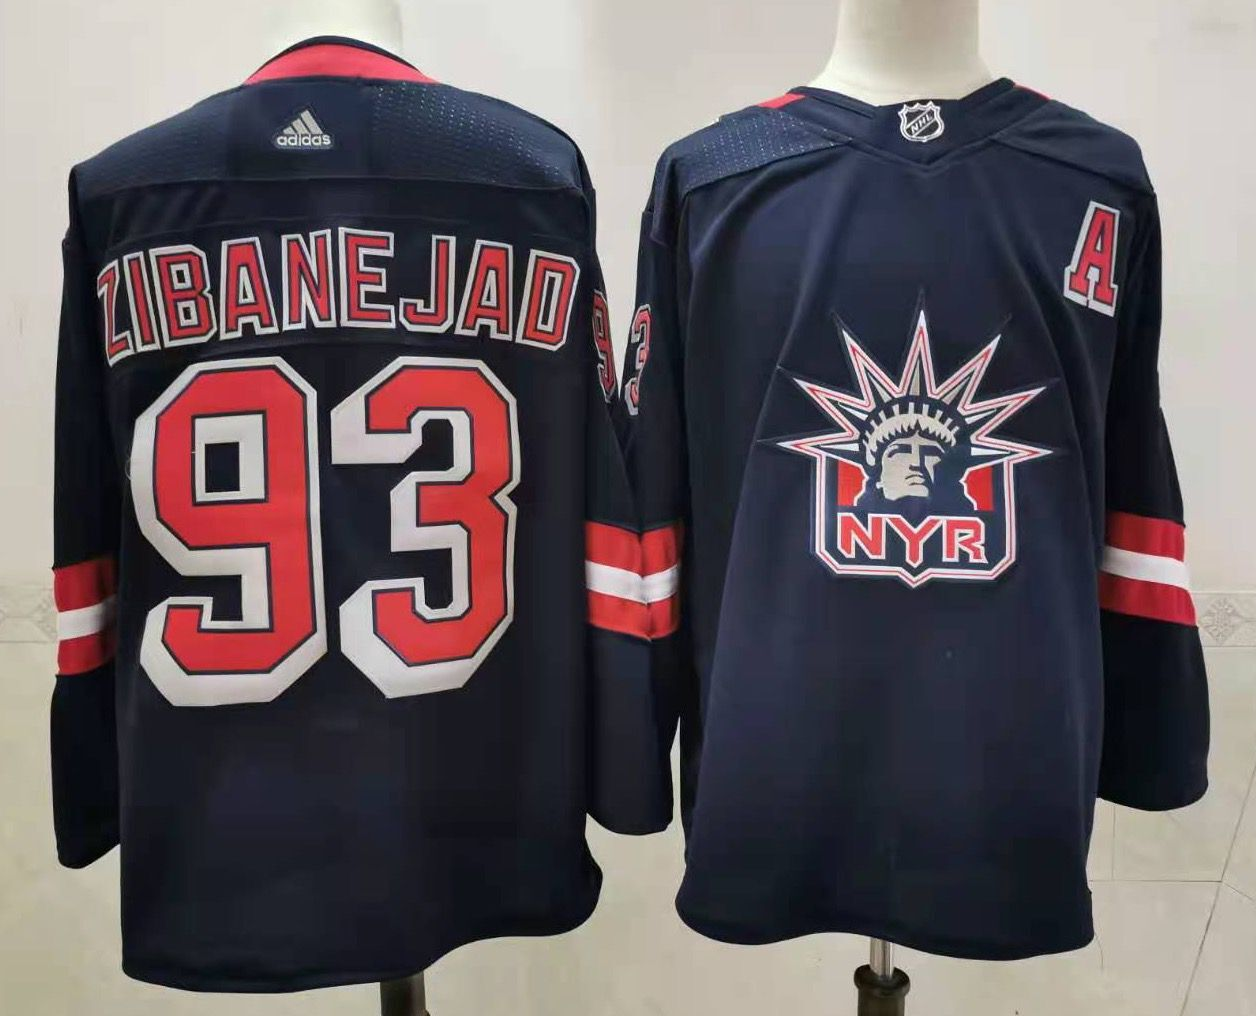 Men's New York Rangers #93 Mika Zibanejad Navy Blue Adidas 2020-21 Stitched NHL Jersey